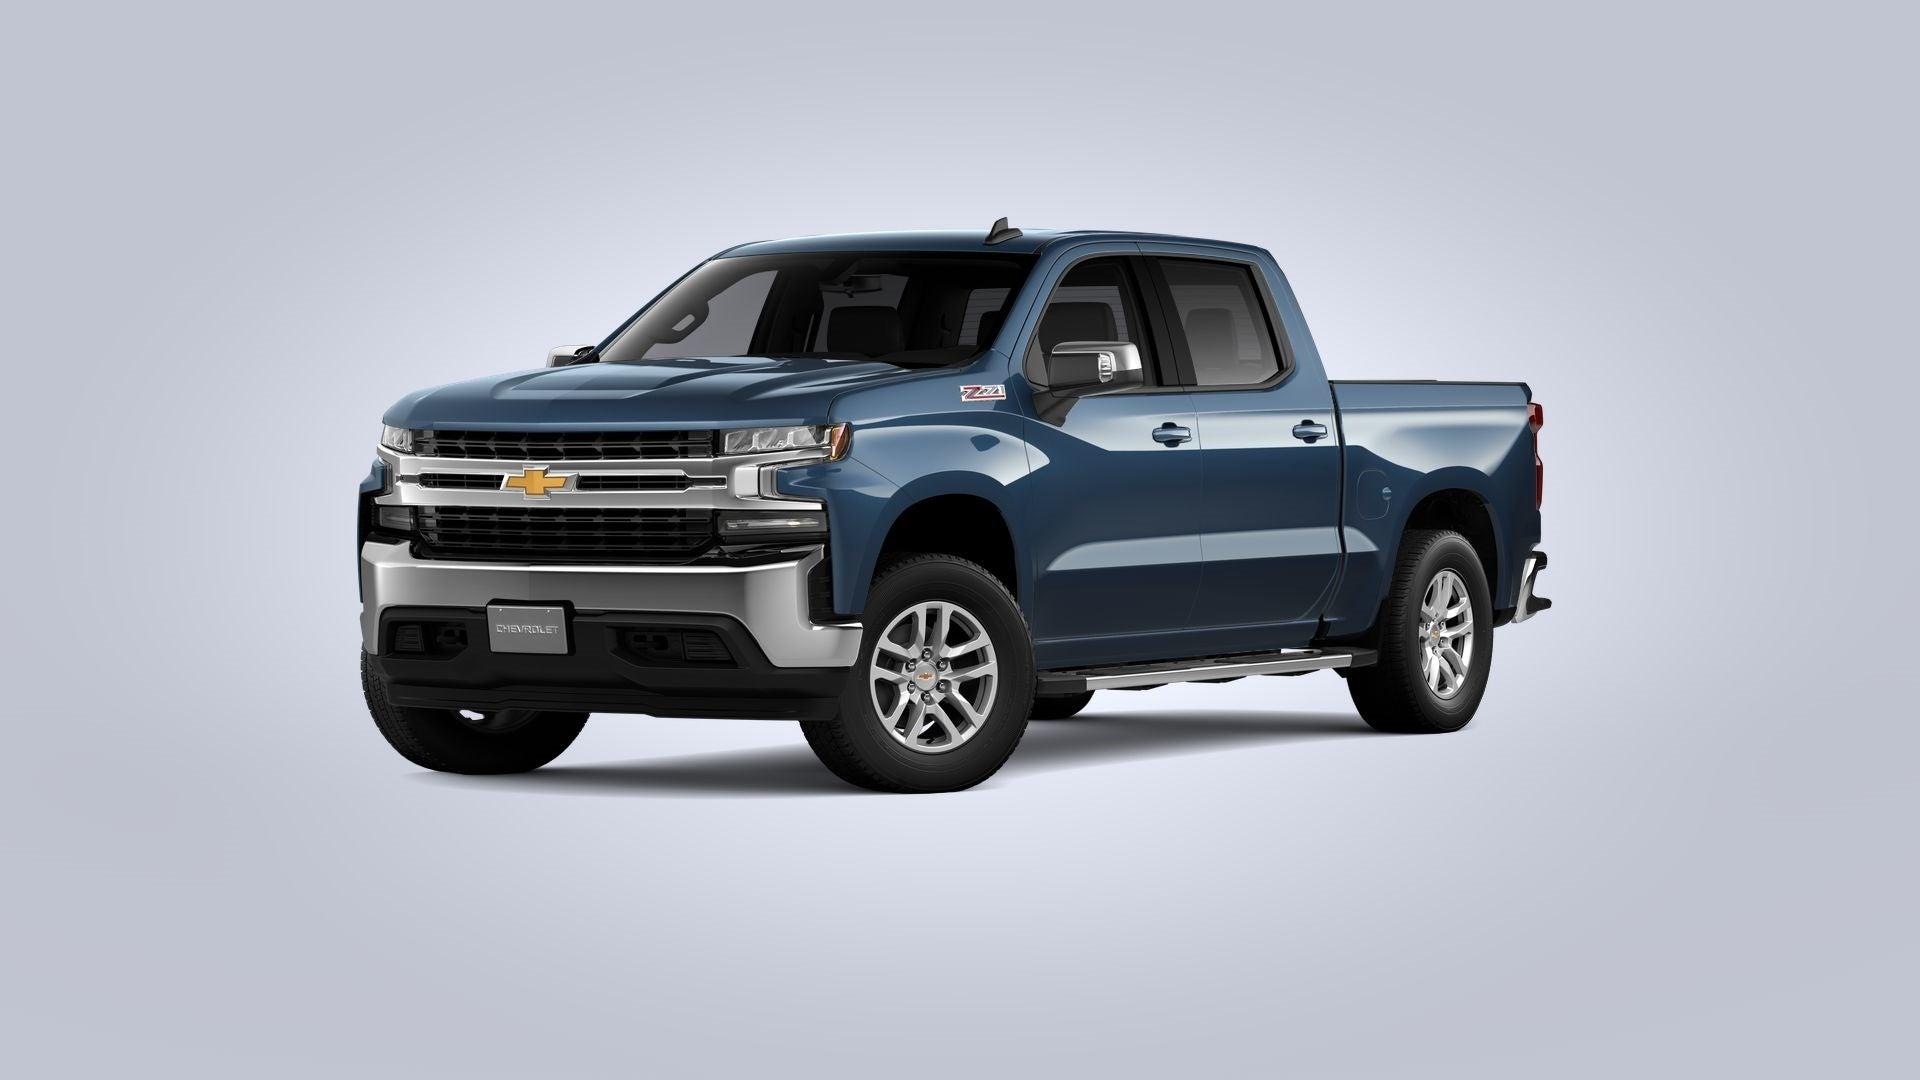 2021 Chevrolet Silverado Neillsville WI